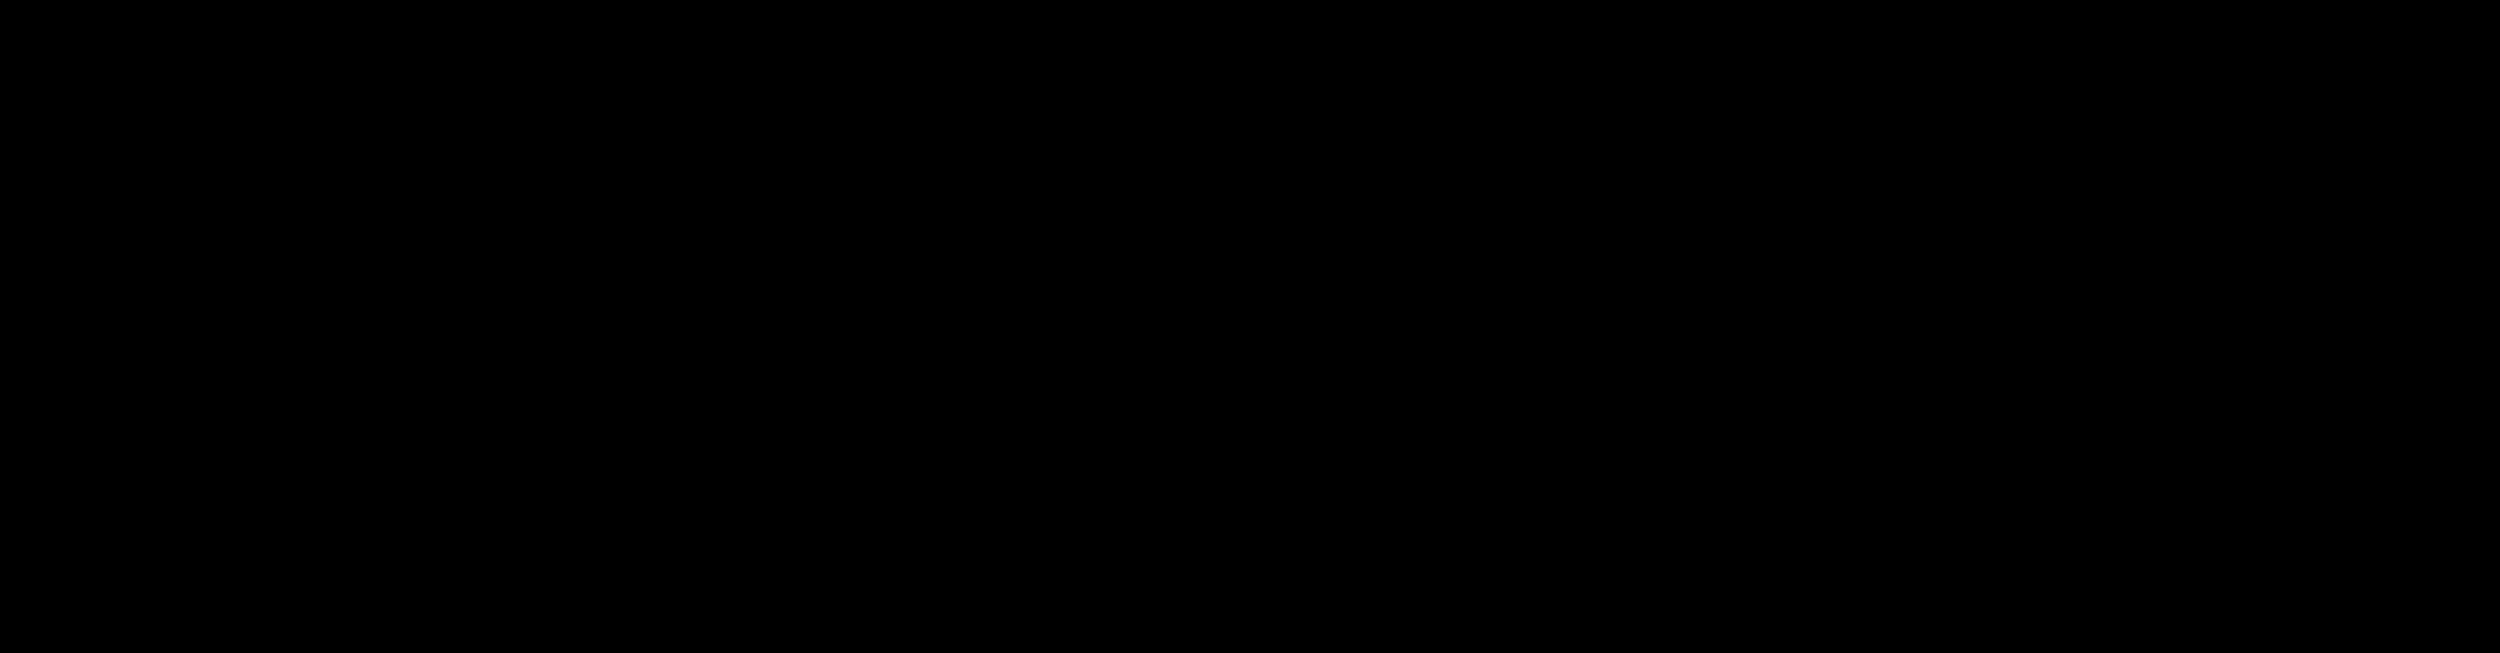 LOR-002-webBanners-transparent_2.png